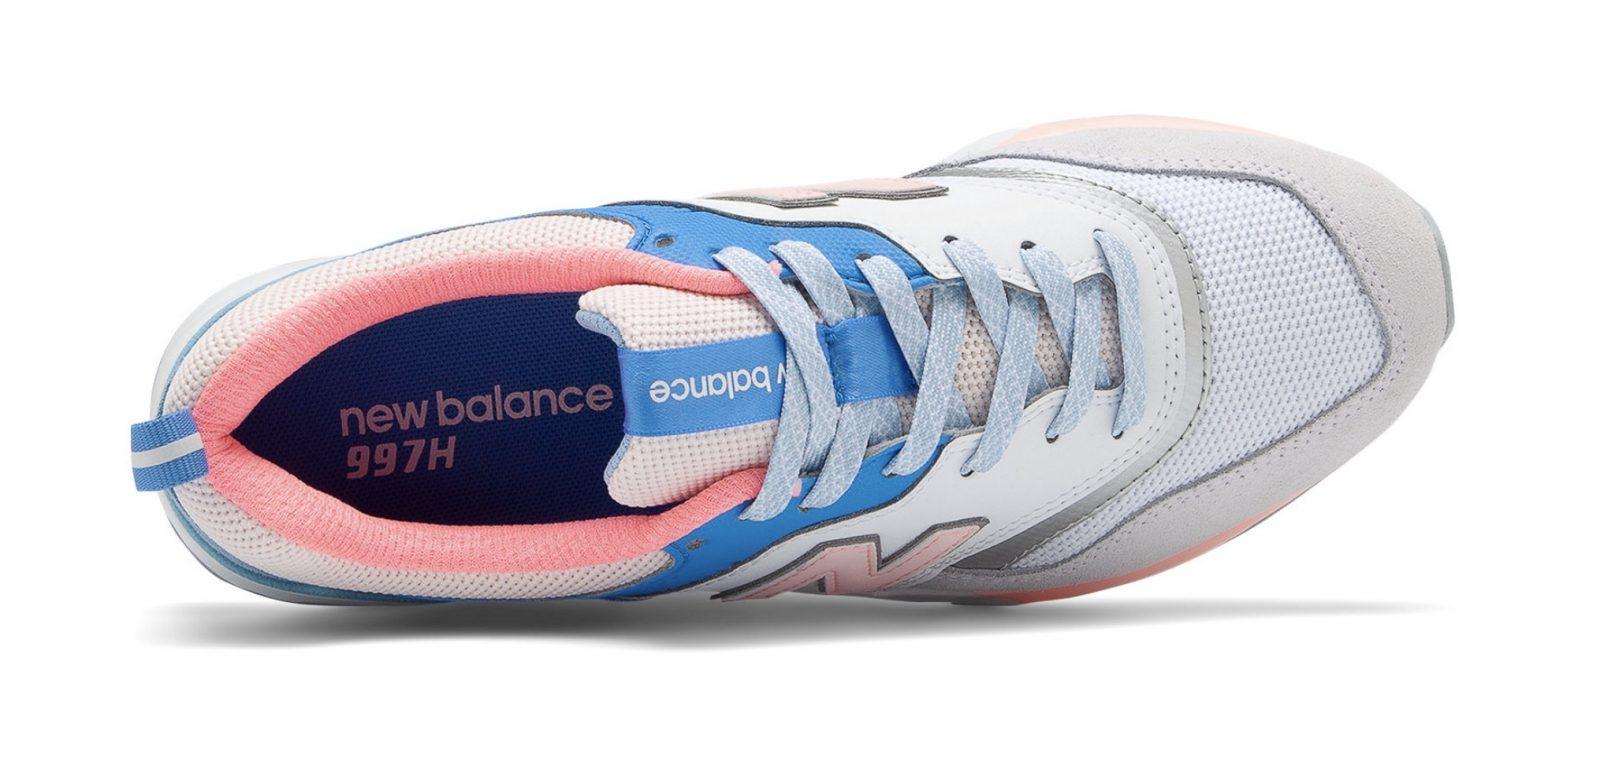 New Balance 997H Blue Guava Glo laces